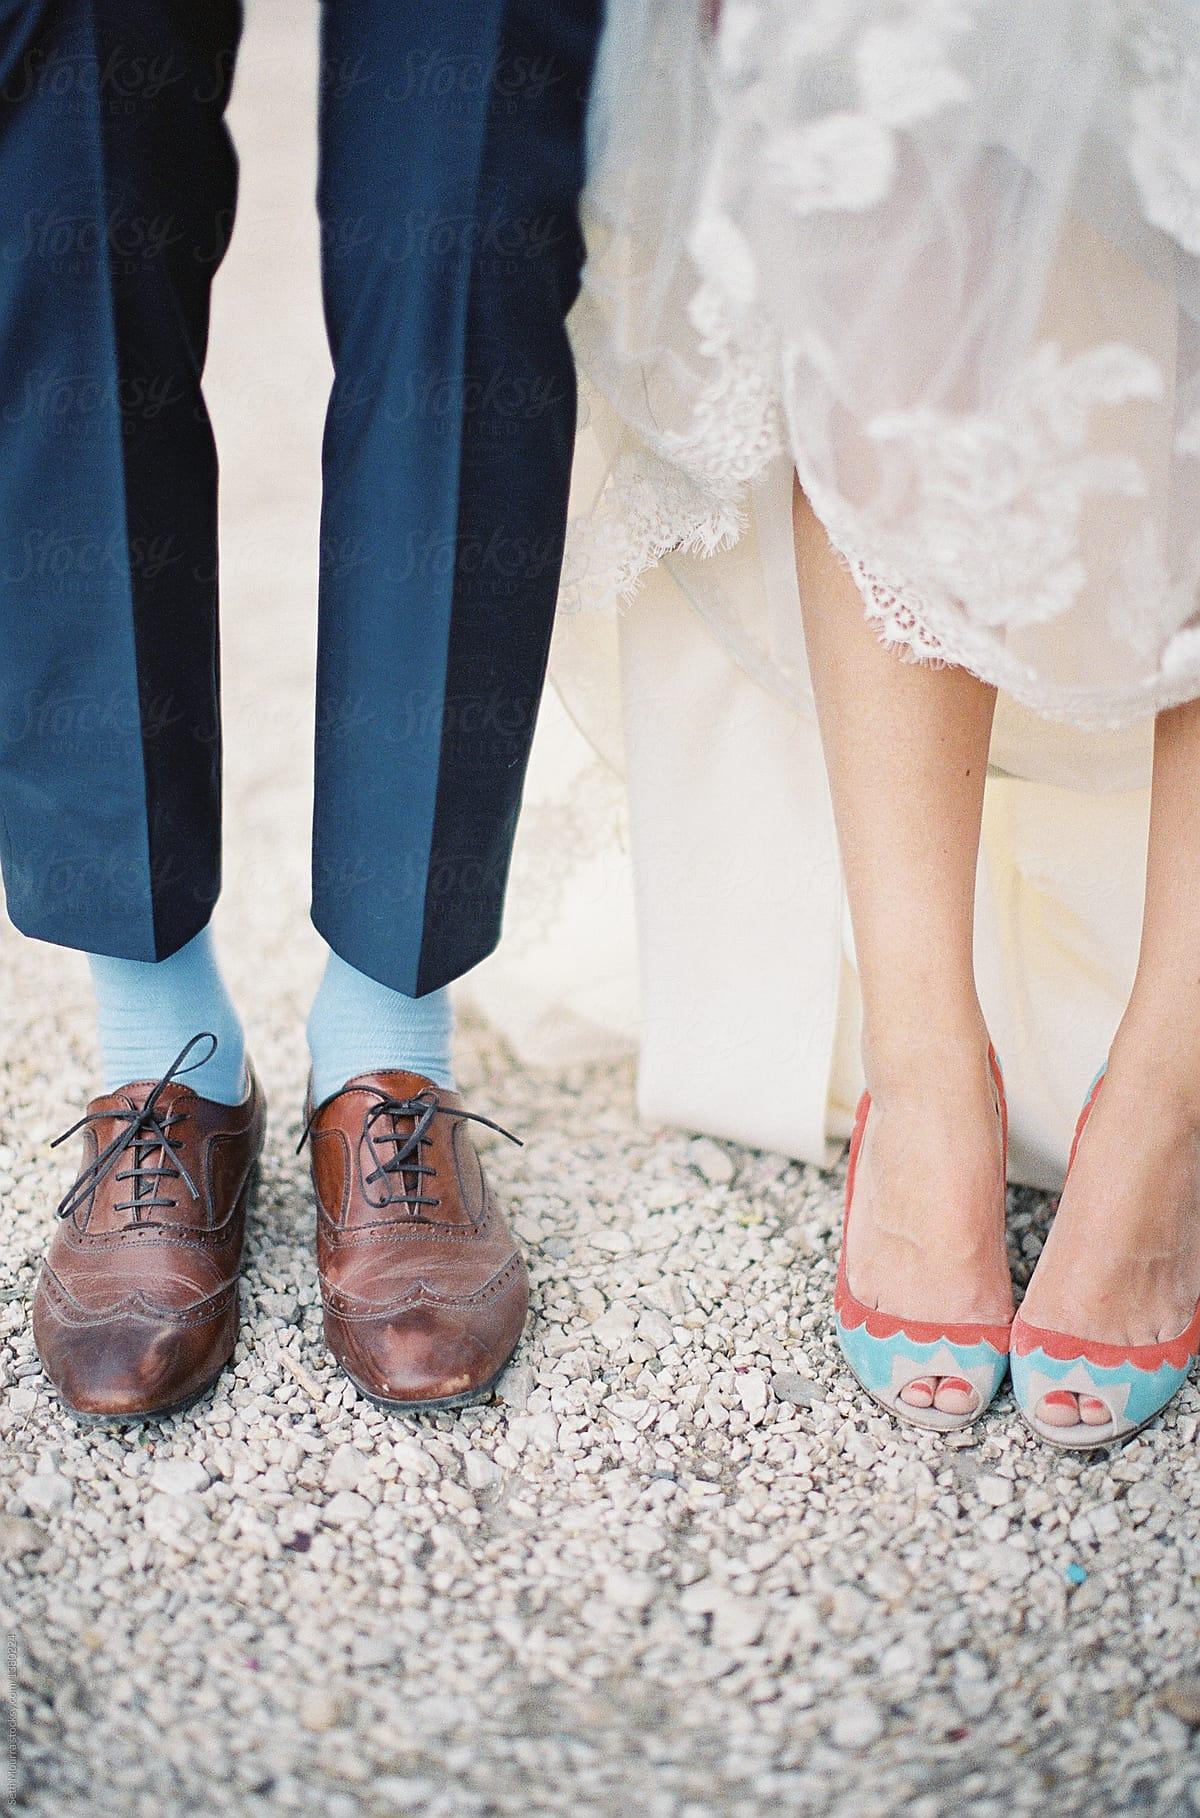 Bride \u0026 Groom shoes by Seth Mourra